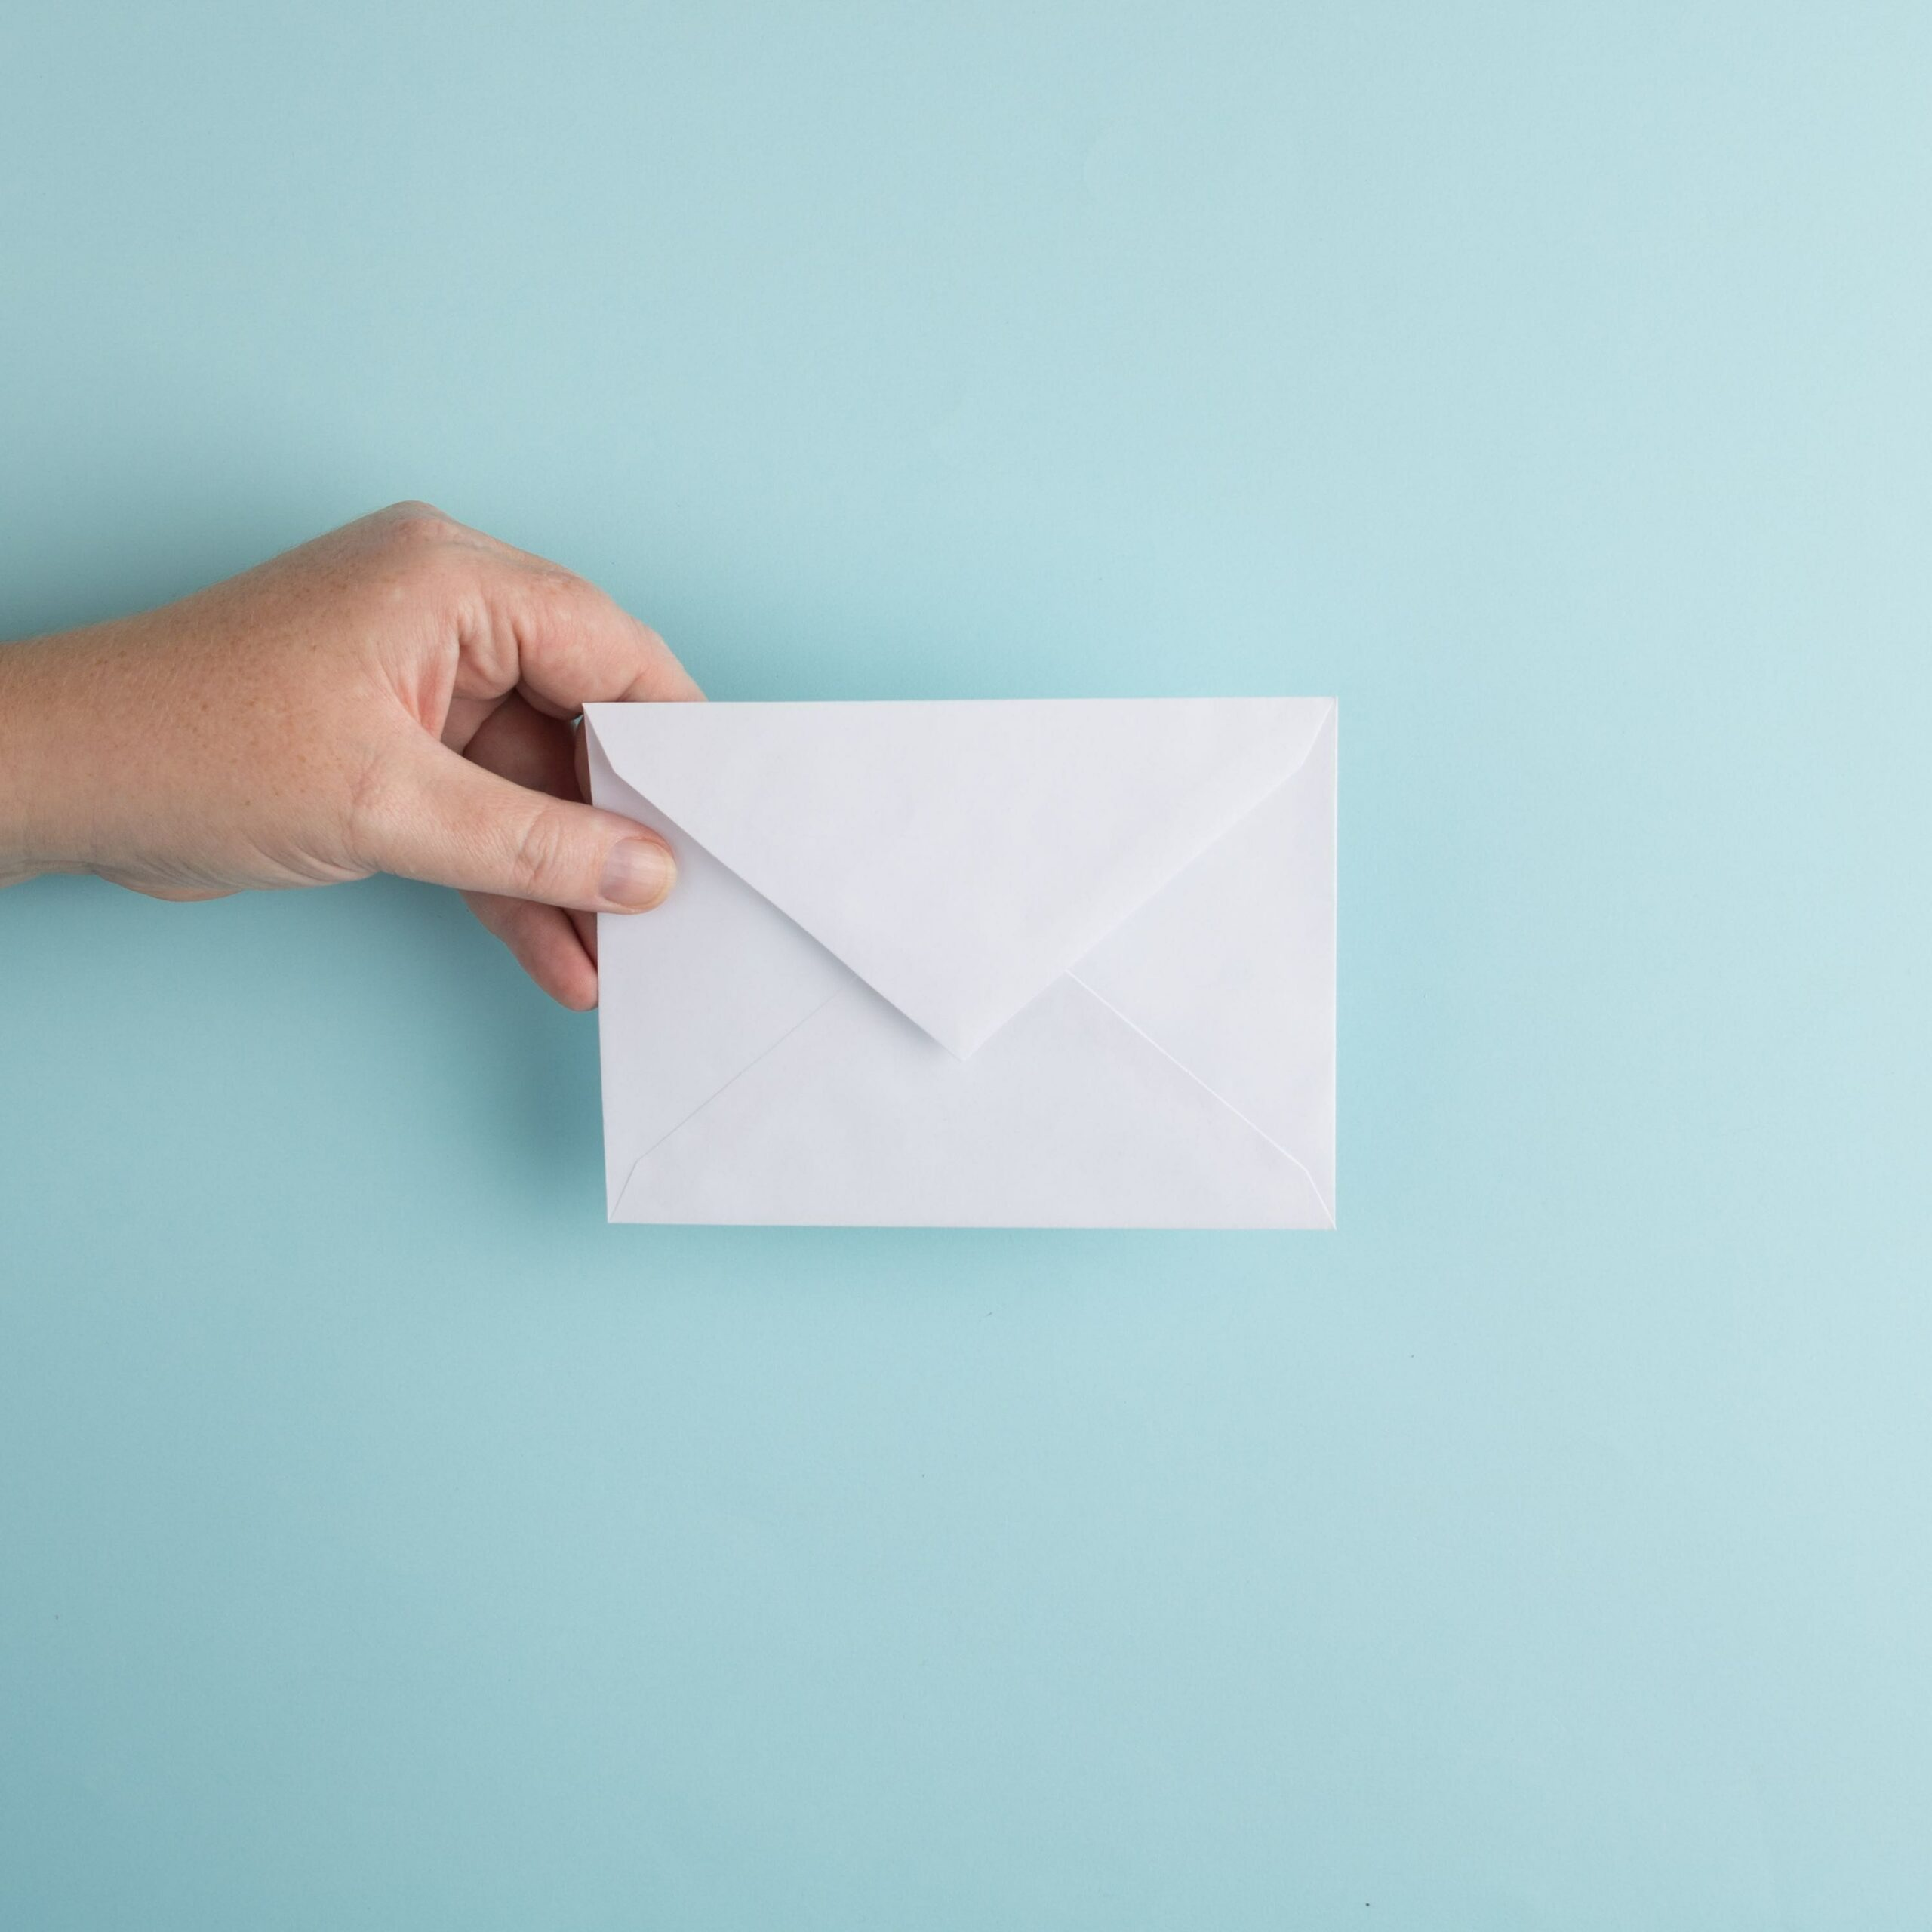 photo : enveloppe, erica steeves, unsplash